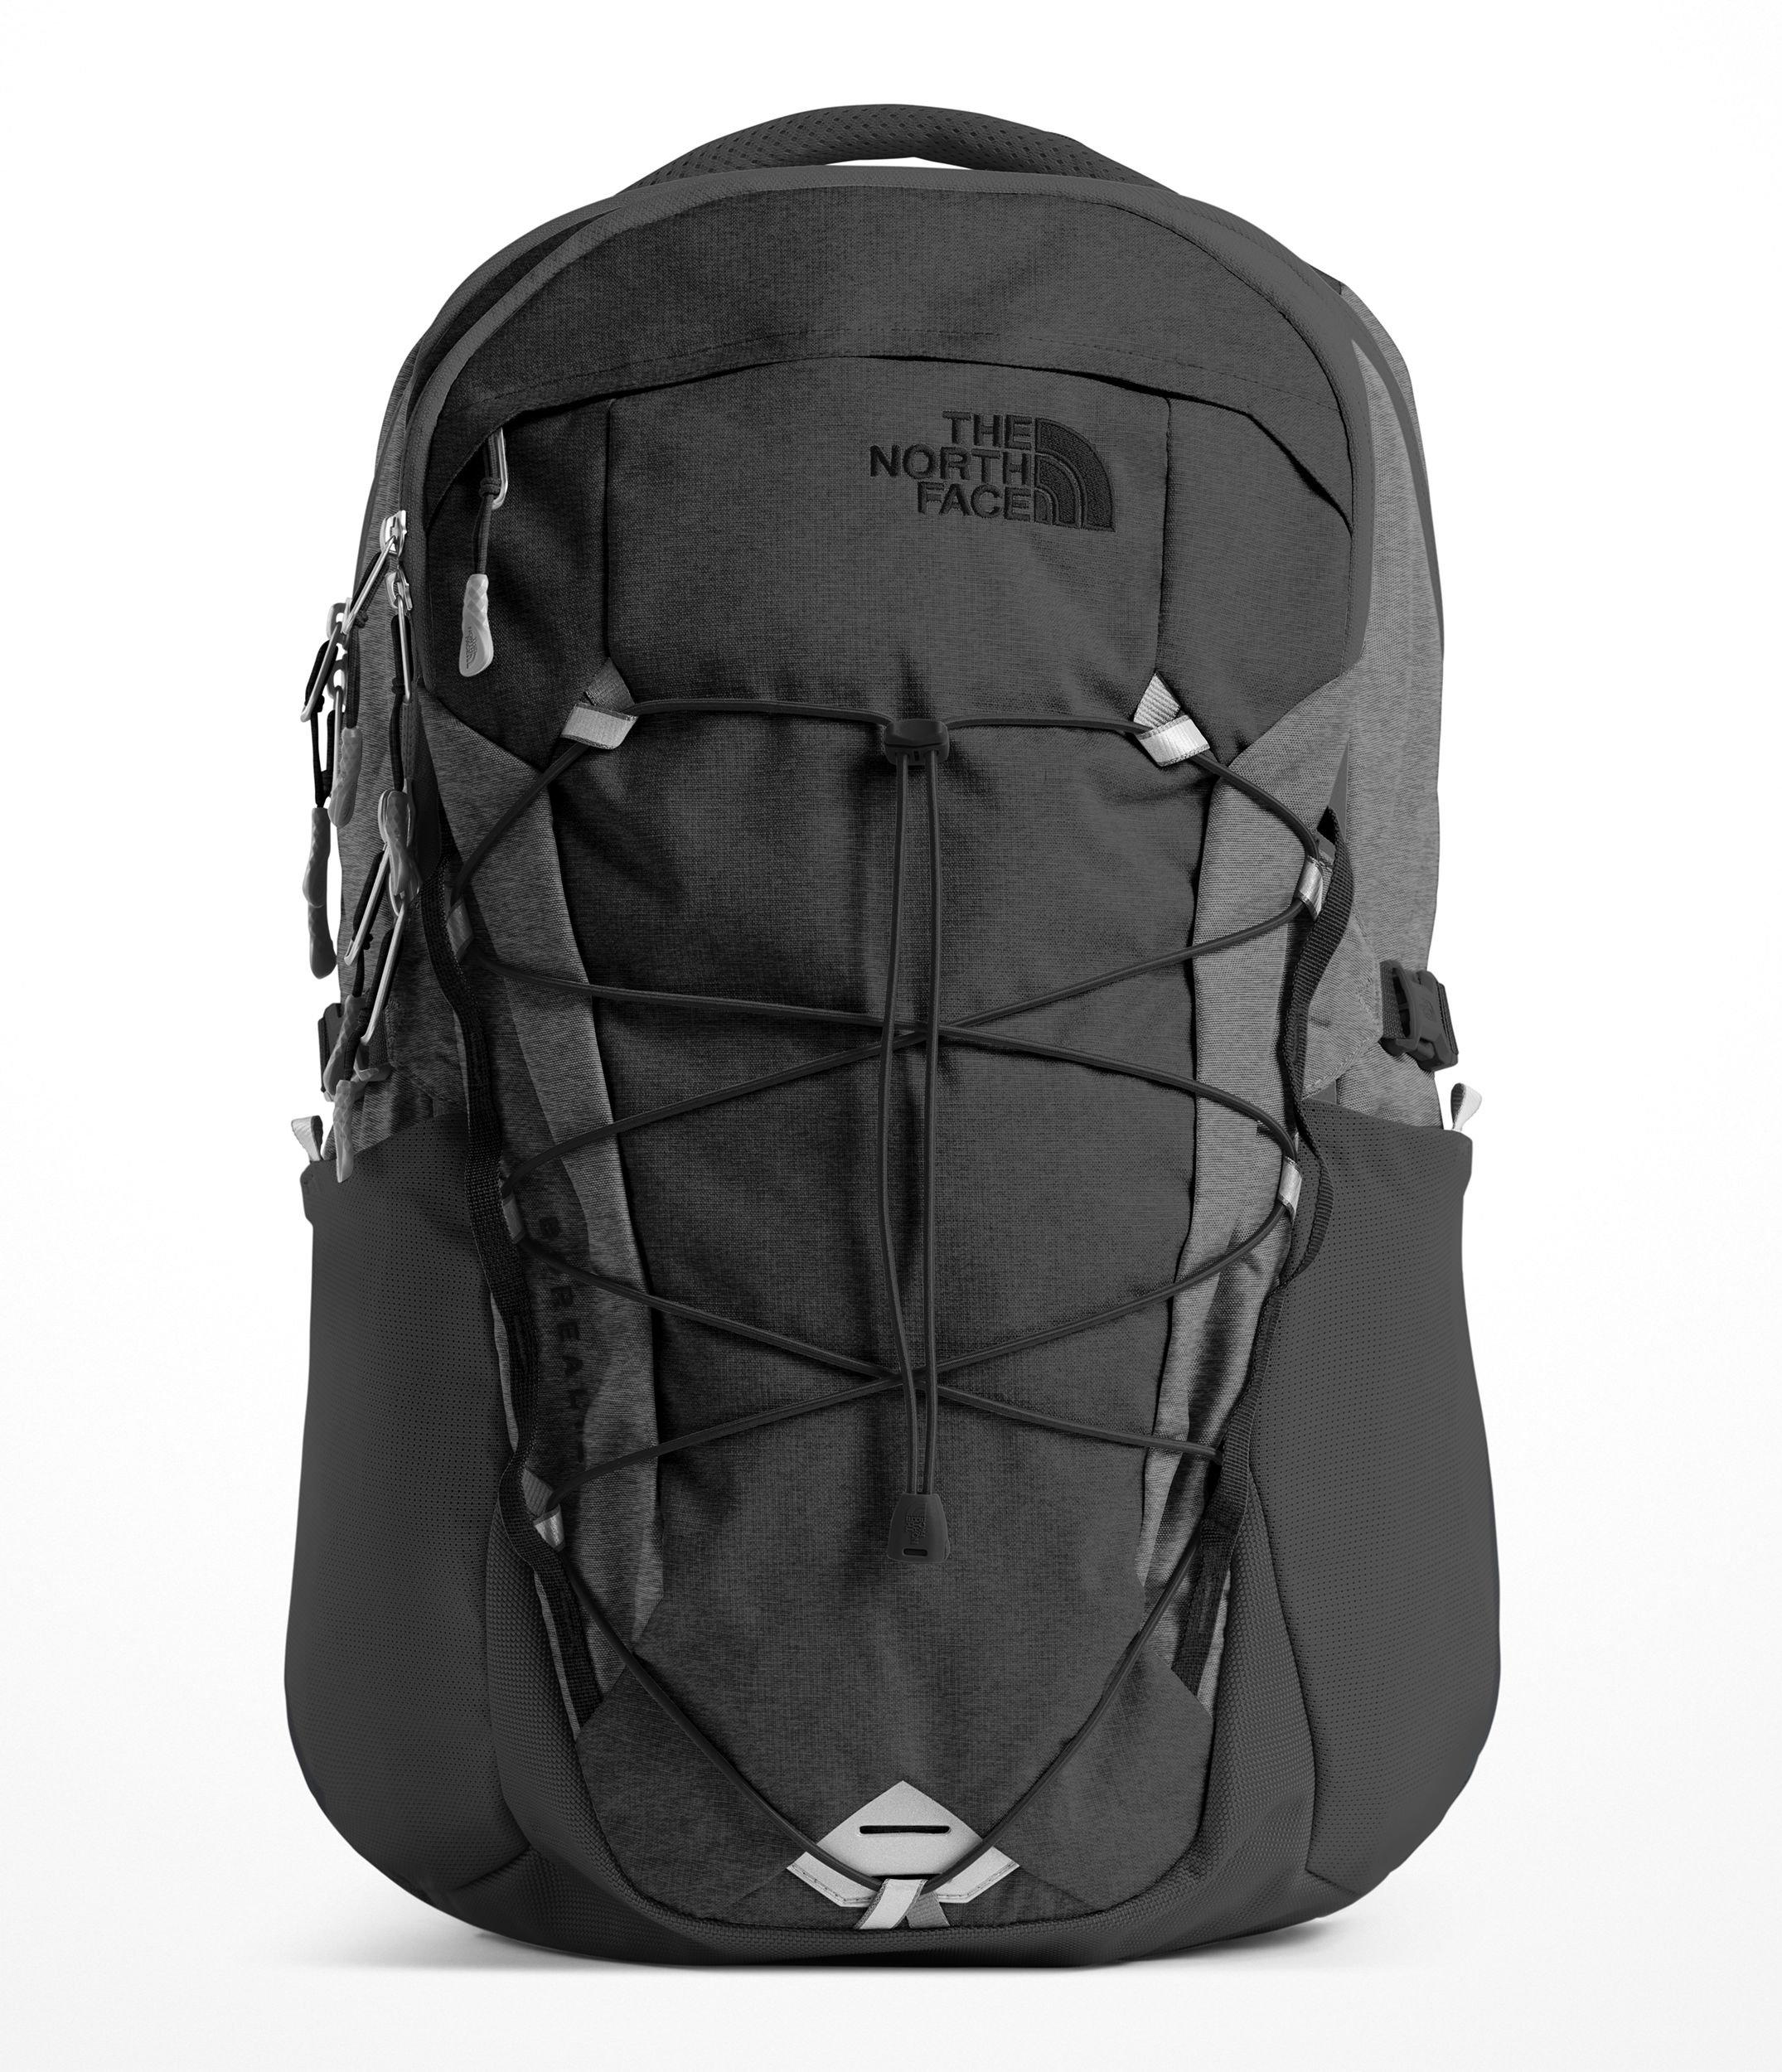 hot sale online f0e05 8a151 The North Face Unisex Rucksack Borealis Chk4 – TLMODA